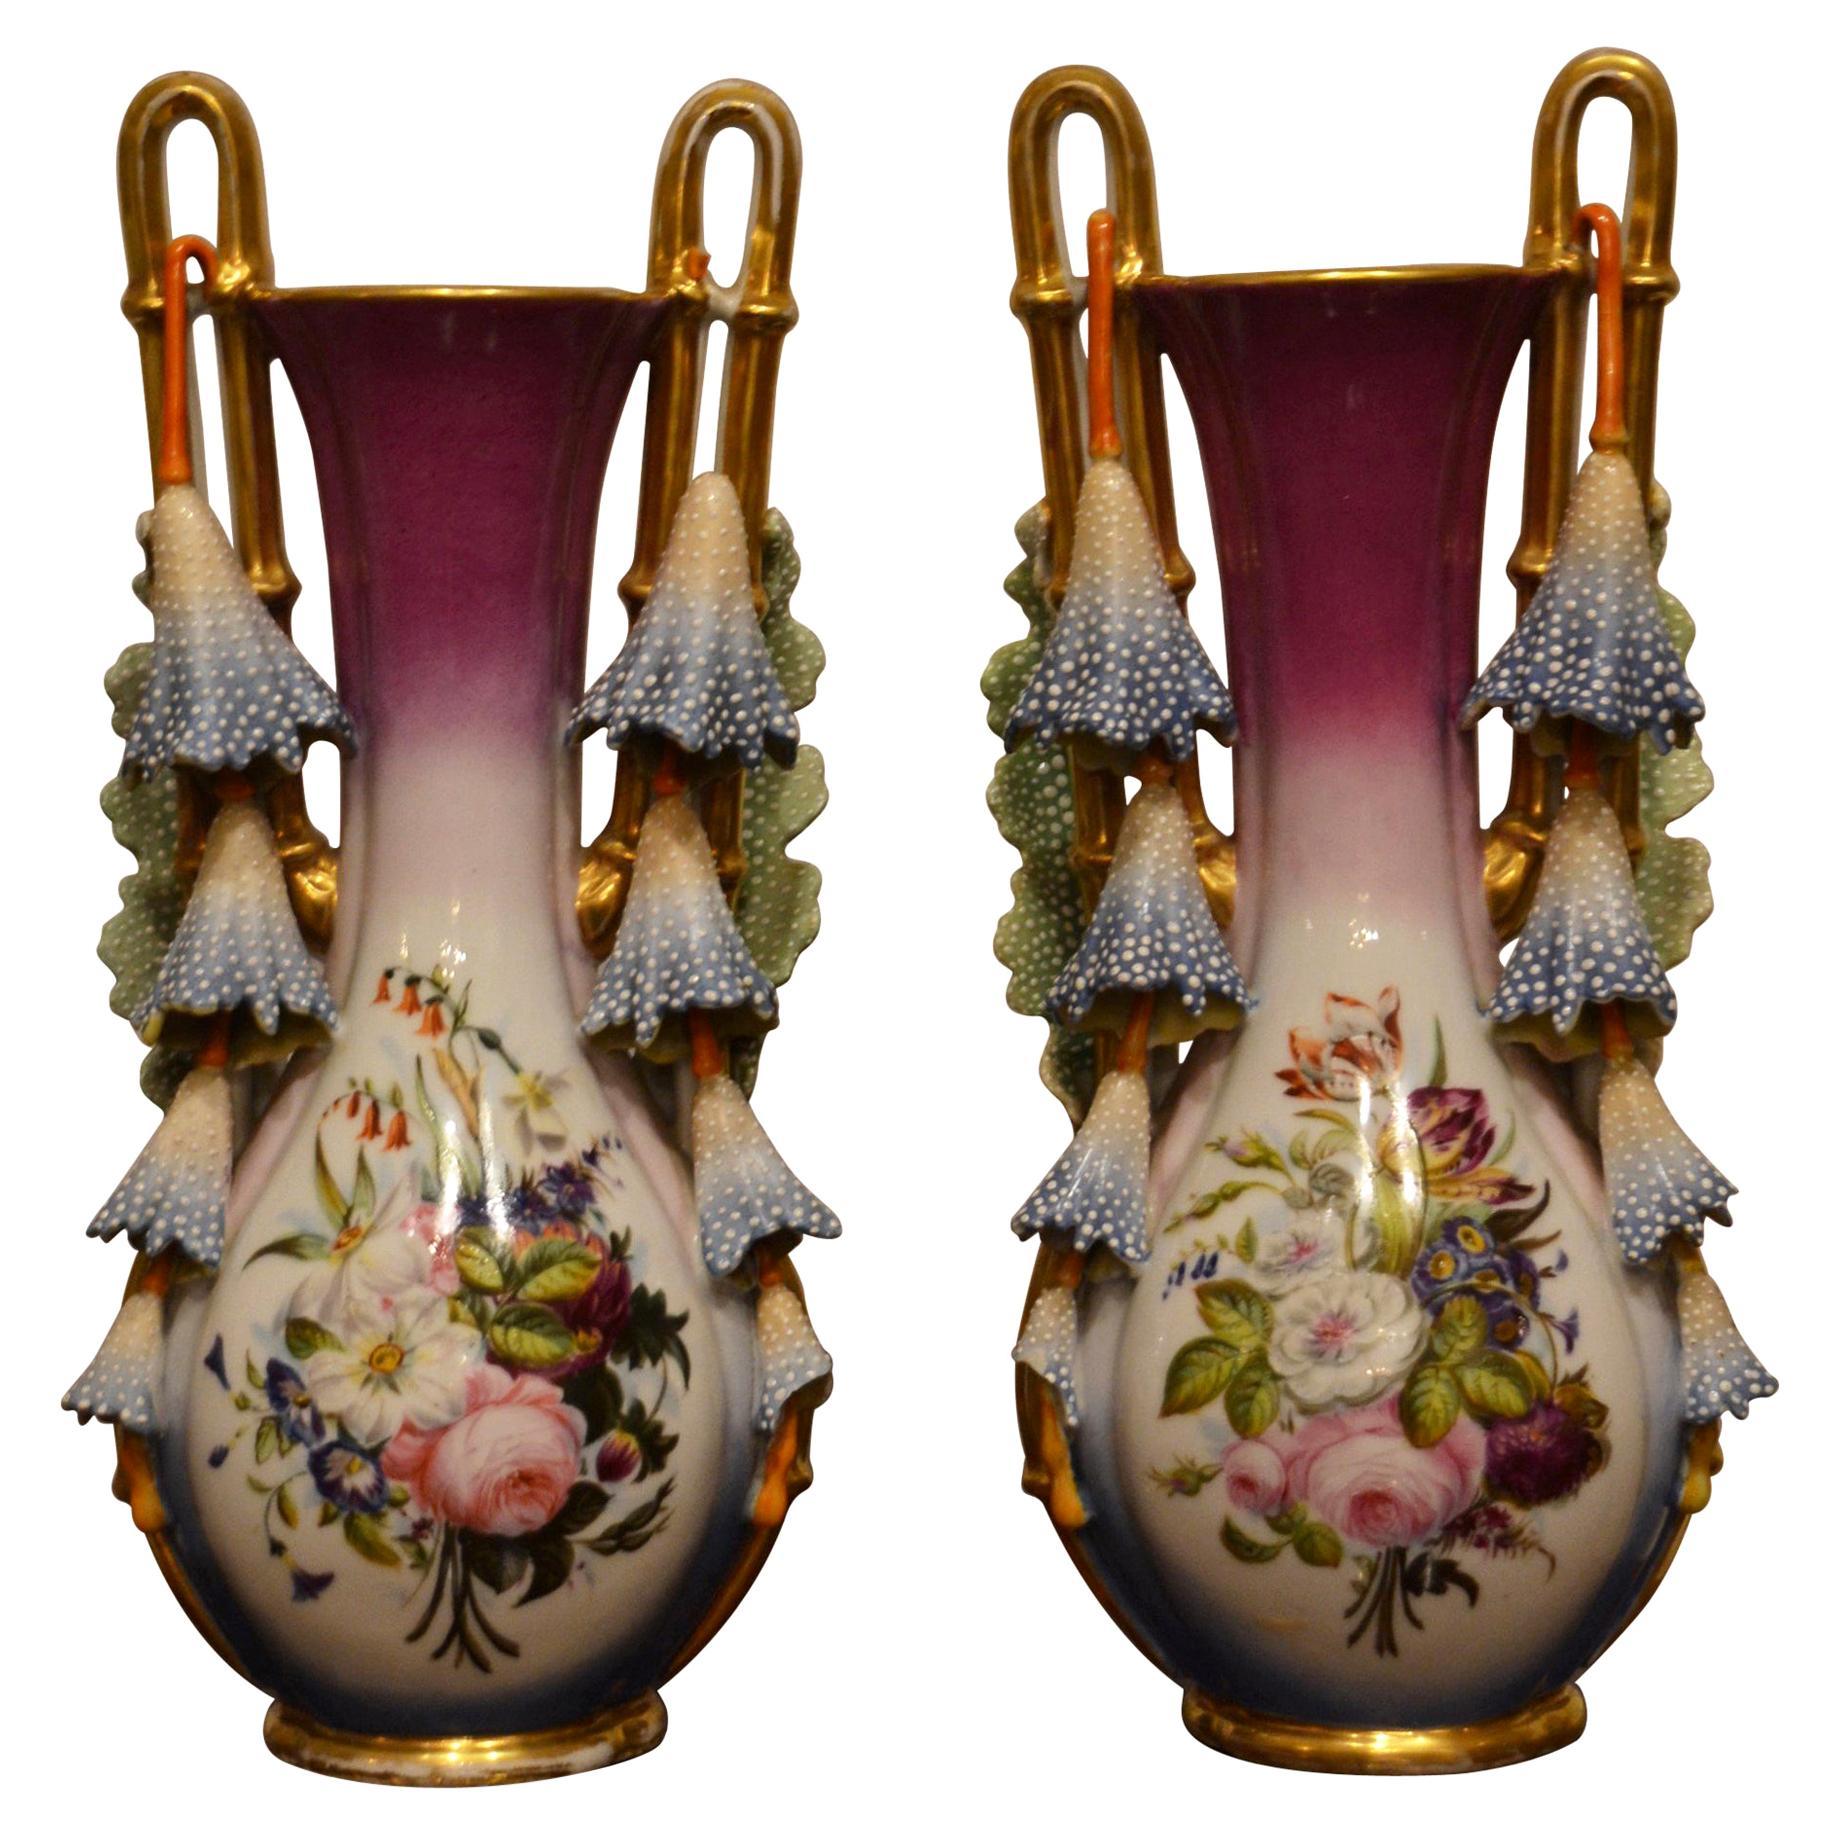 Pair of Antique Vieux Paris Old New Orleans Porcelain Vases from a Creole Estate